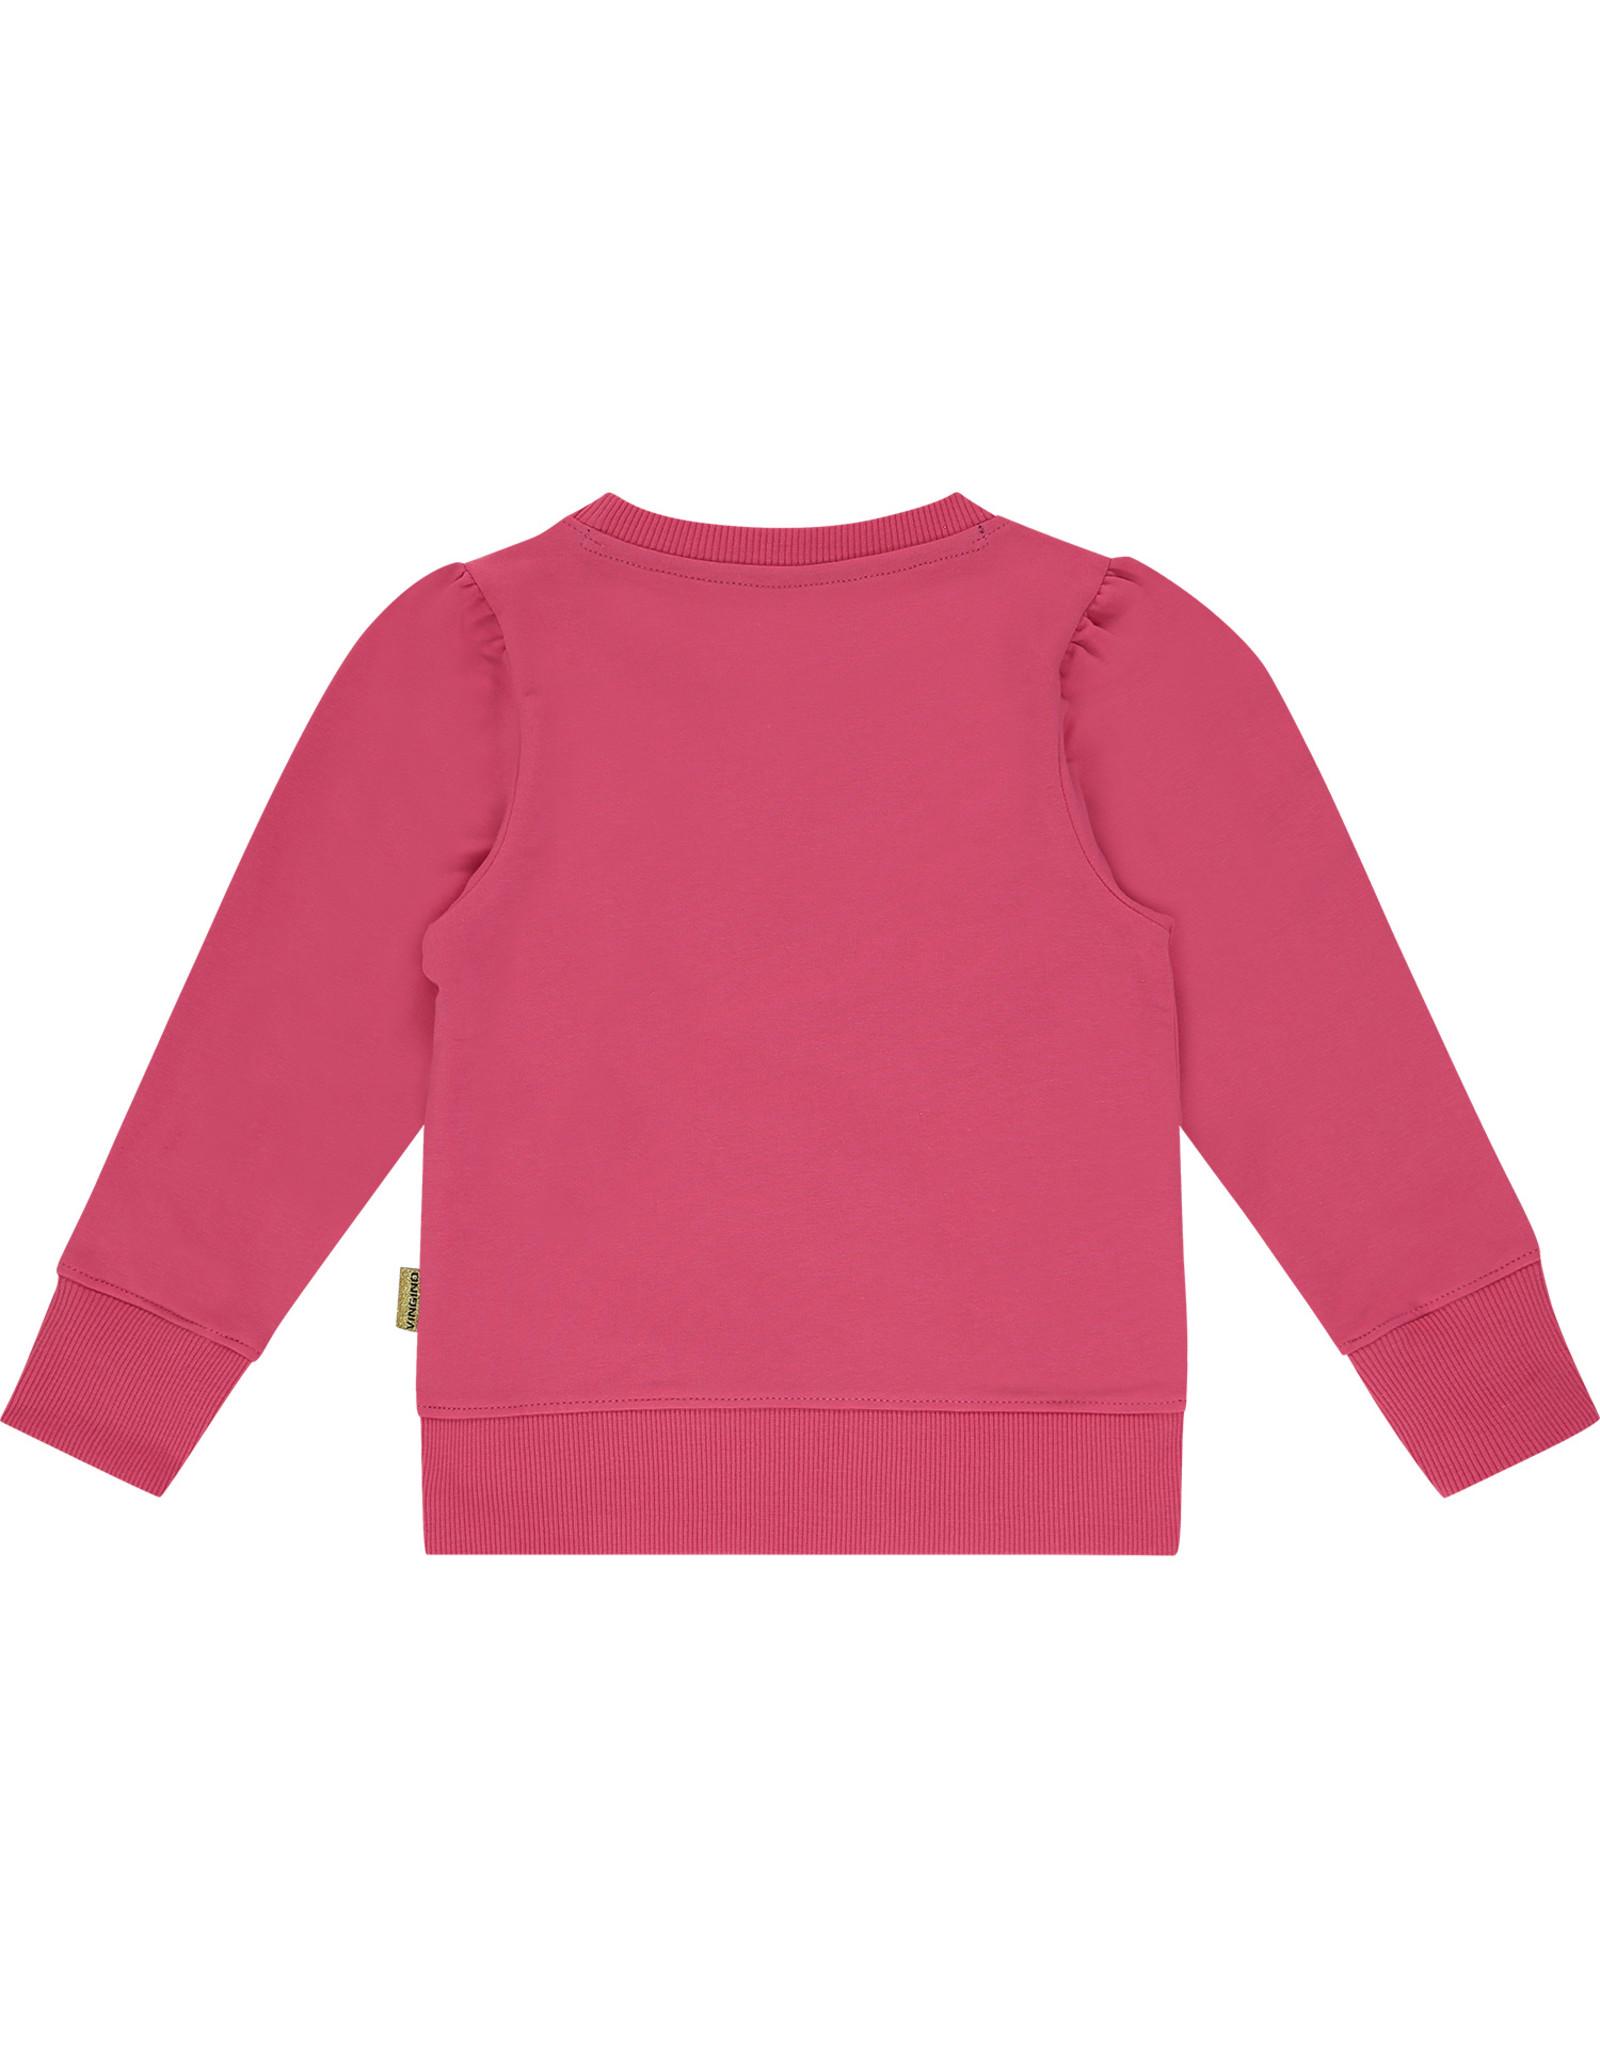 Vingino Niska mini. Power Pink